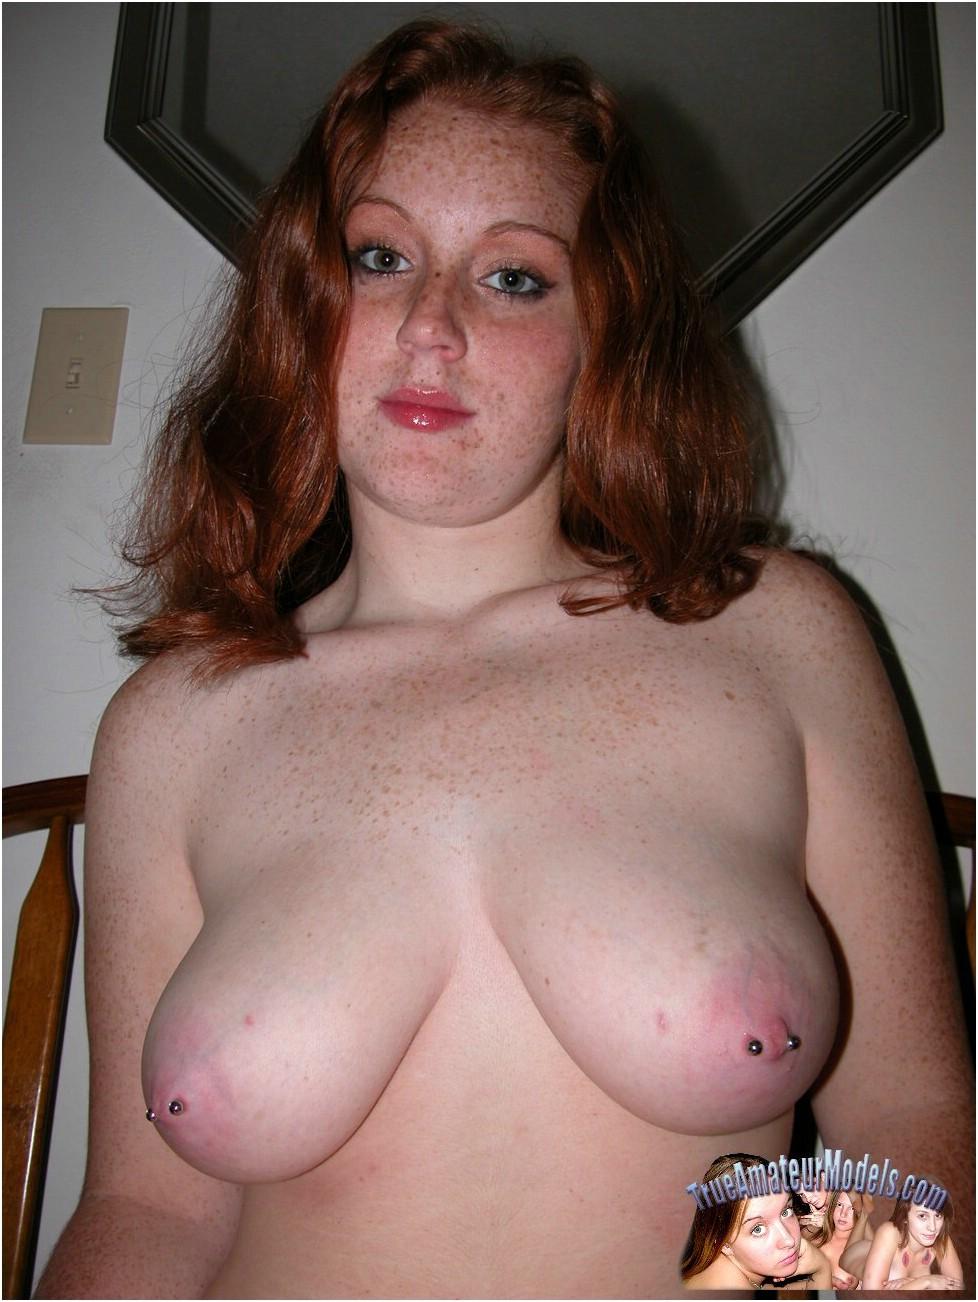 celeste-true-amateur-models-redhead